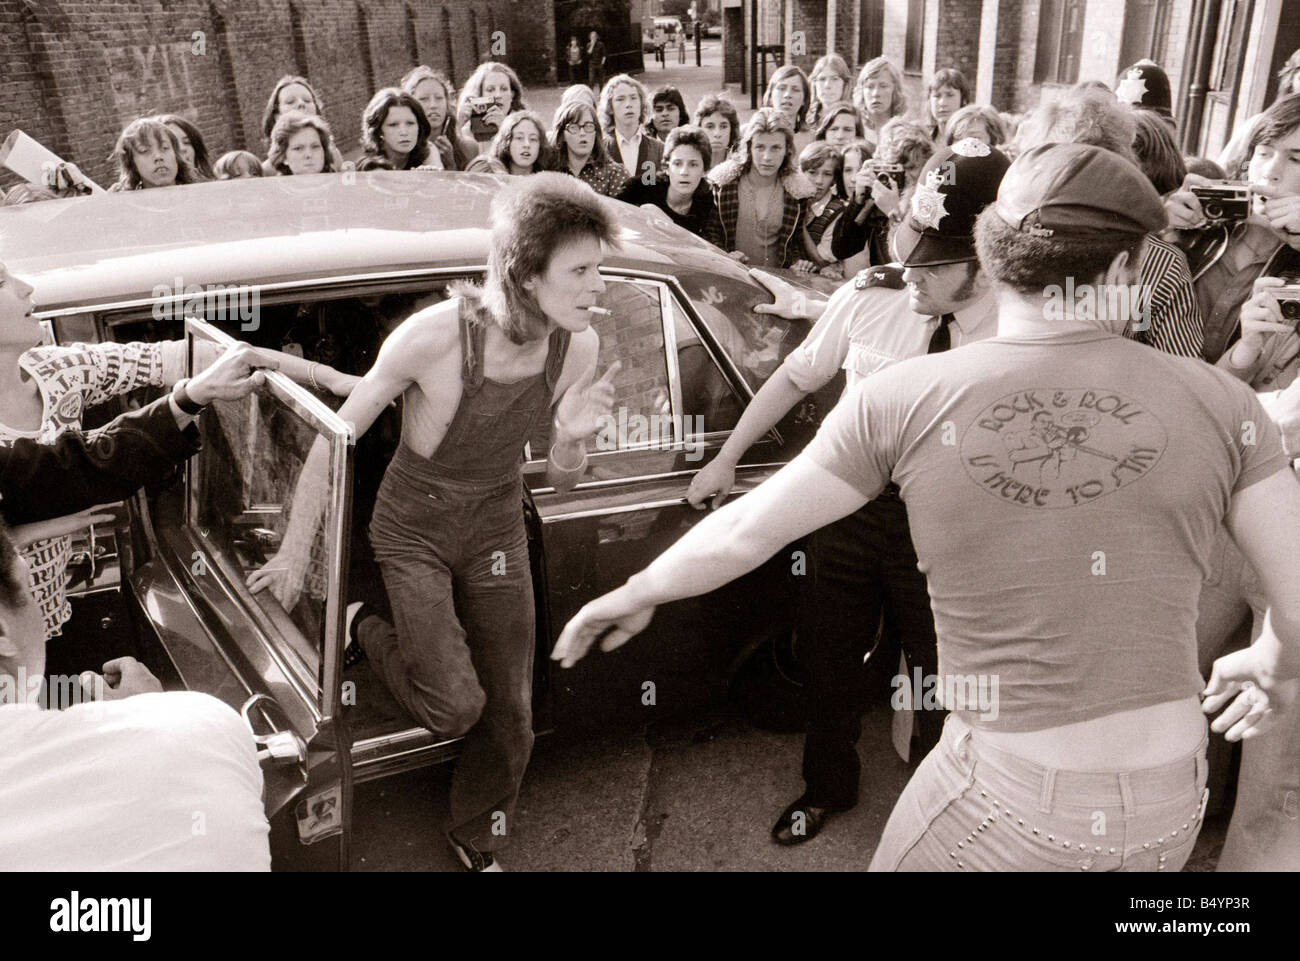 David Bowie Singer July 1973 arriving at the Odeon Hammersmith gqmagazineusa gqmagazineusa - Stock Image